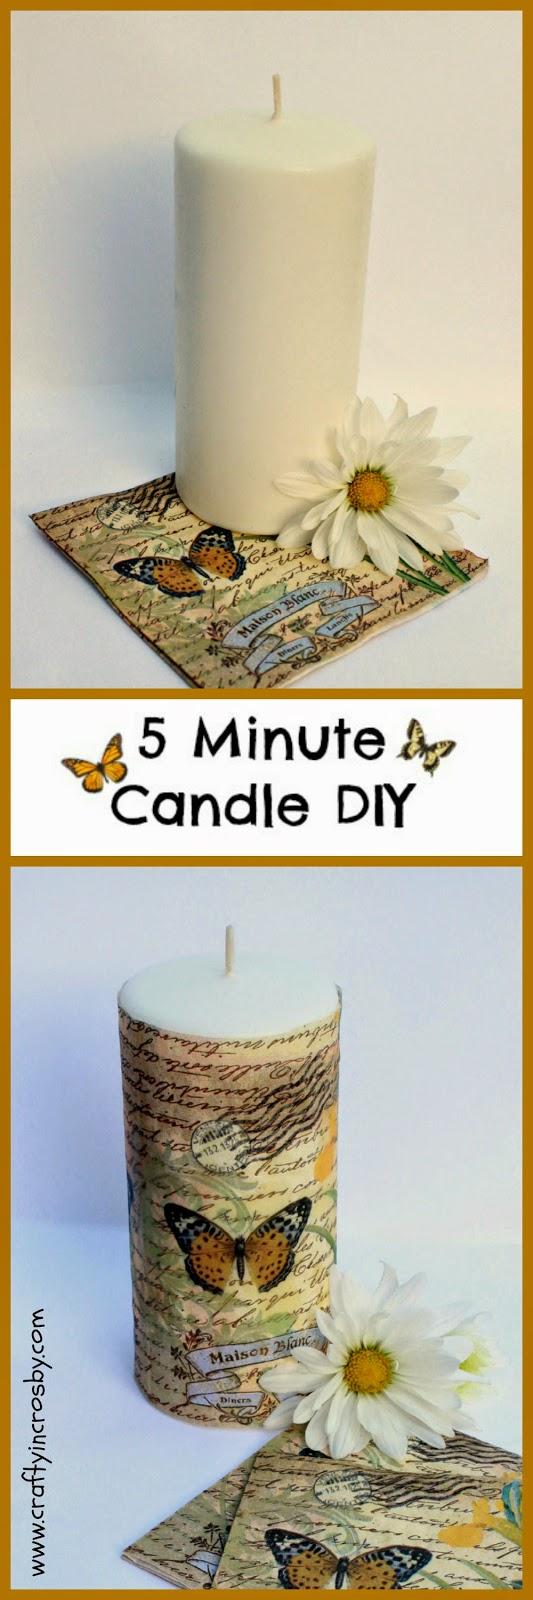 candle diy, designer candle diy, candle hack, candle decoration, Dollar Tree